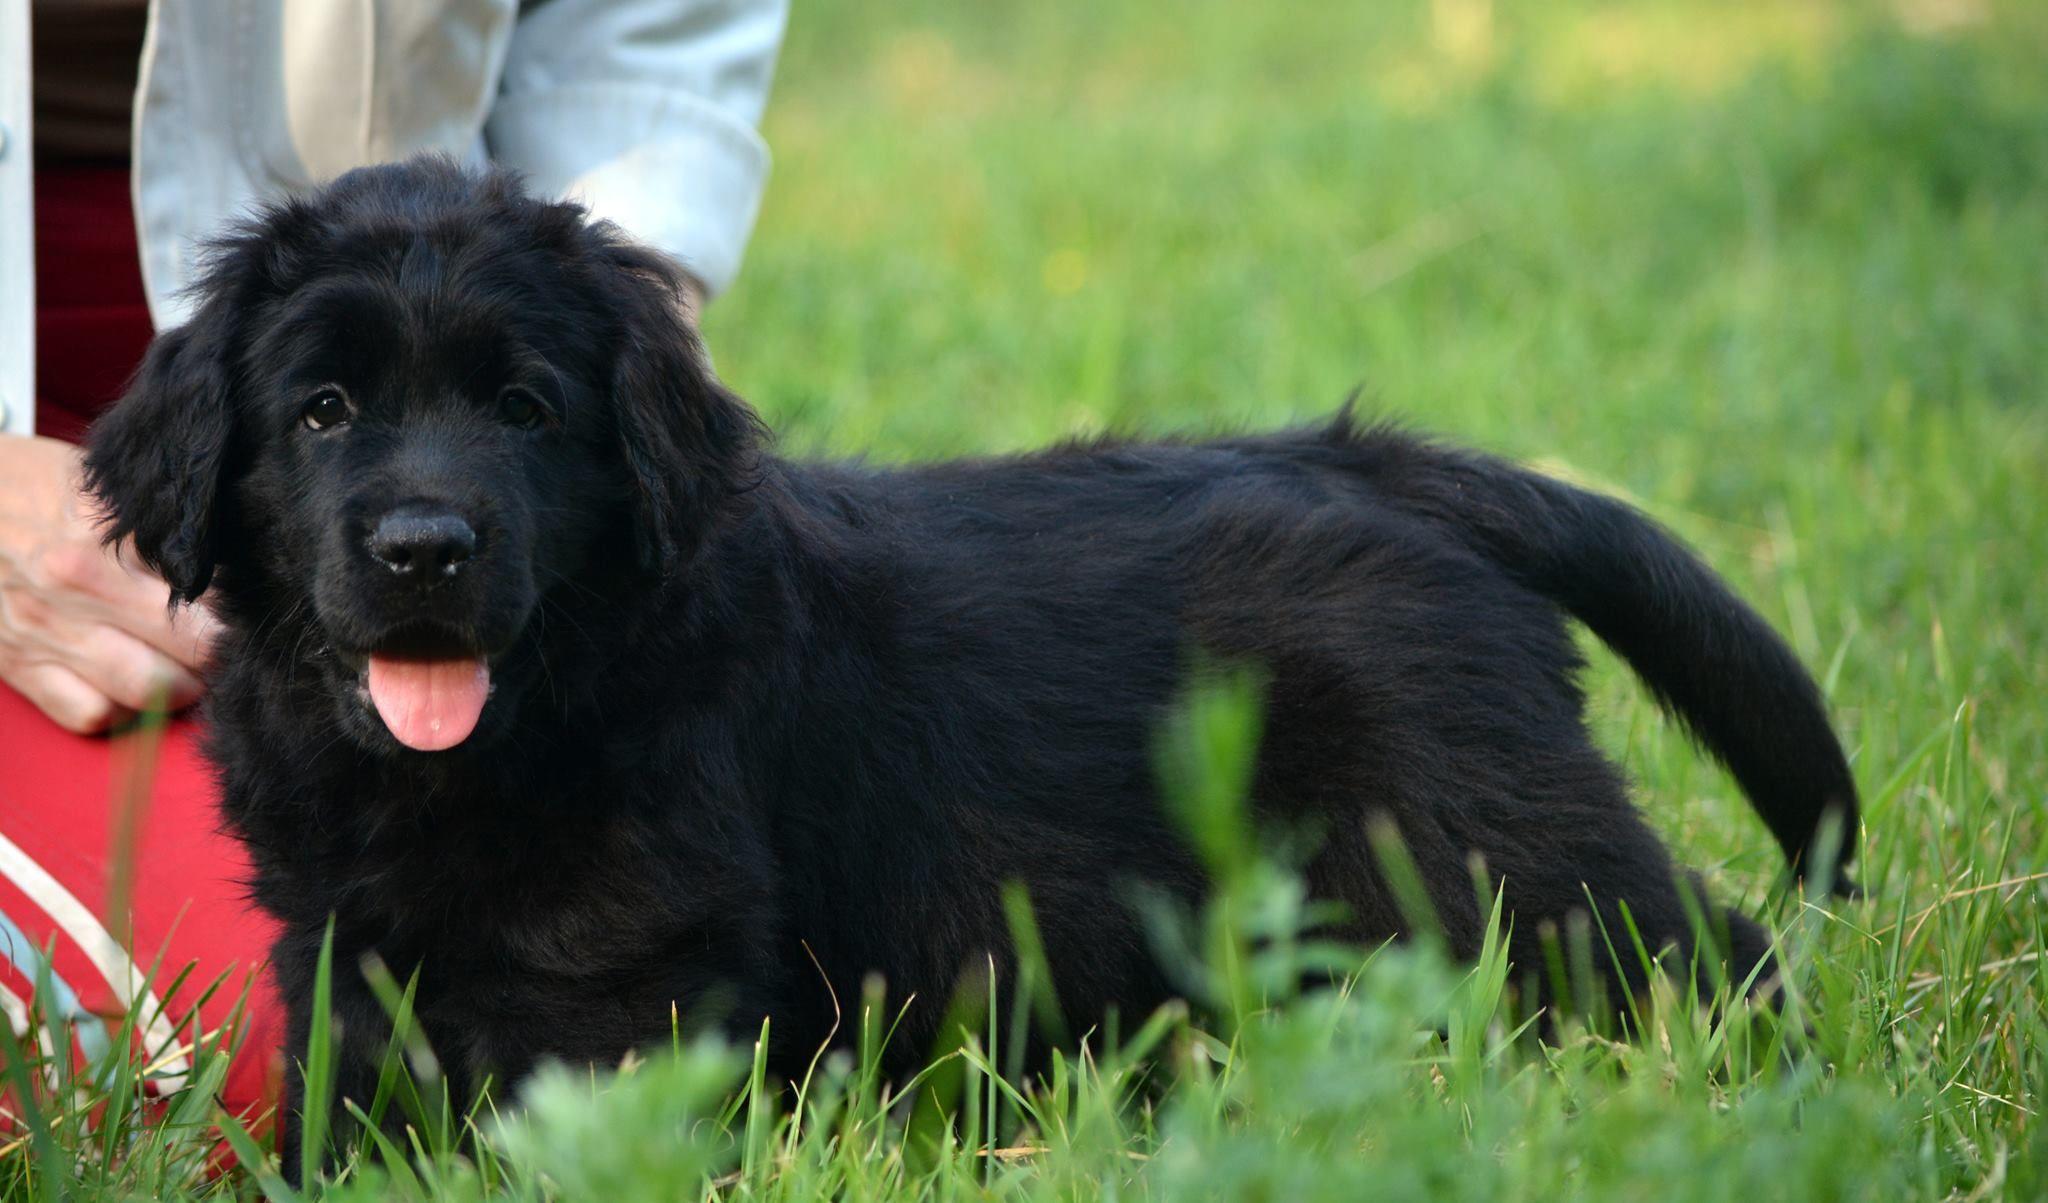 Most Inspiring Labrador Black Adorable Dog - a55c05851c8405940620735c86966176  Snapshot_696747  .jpg